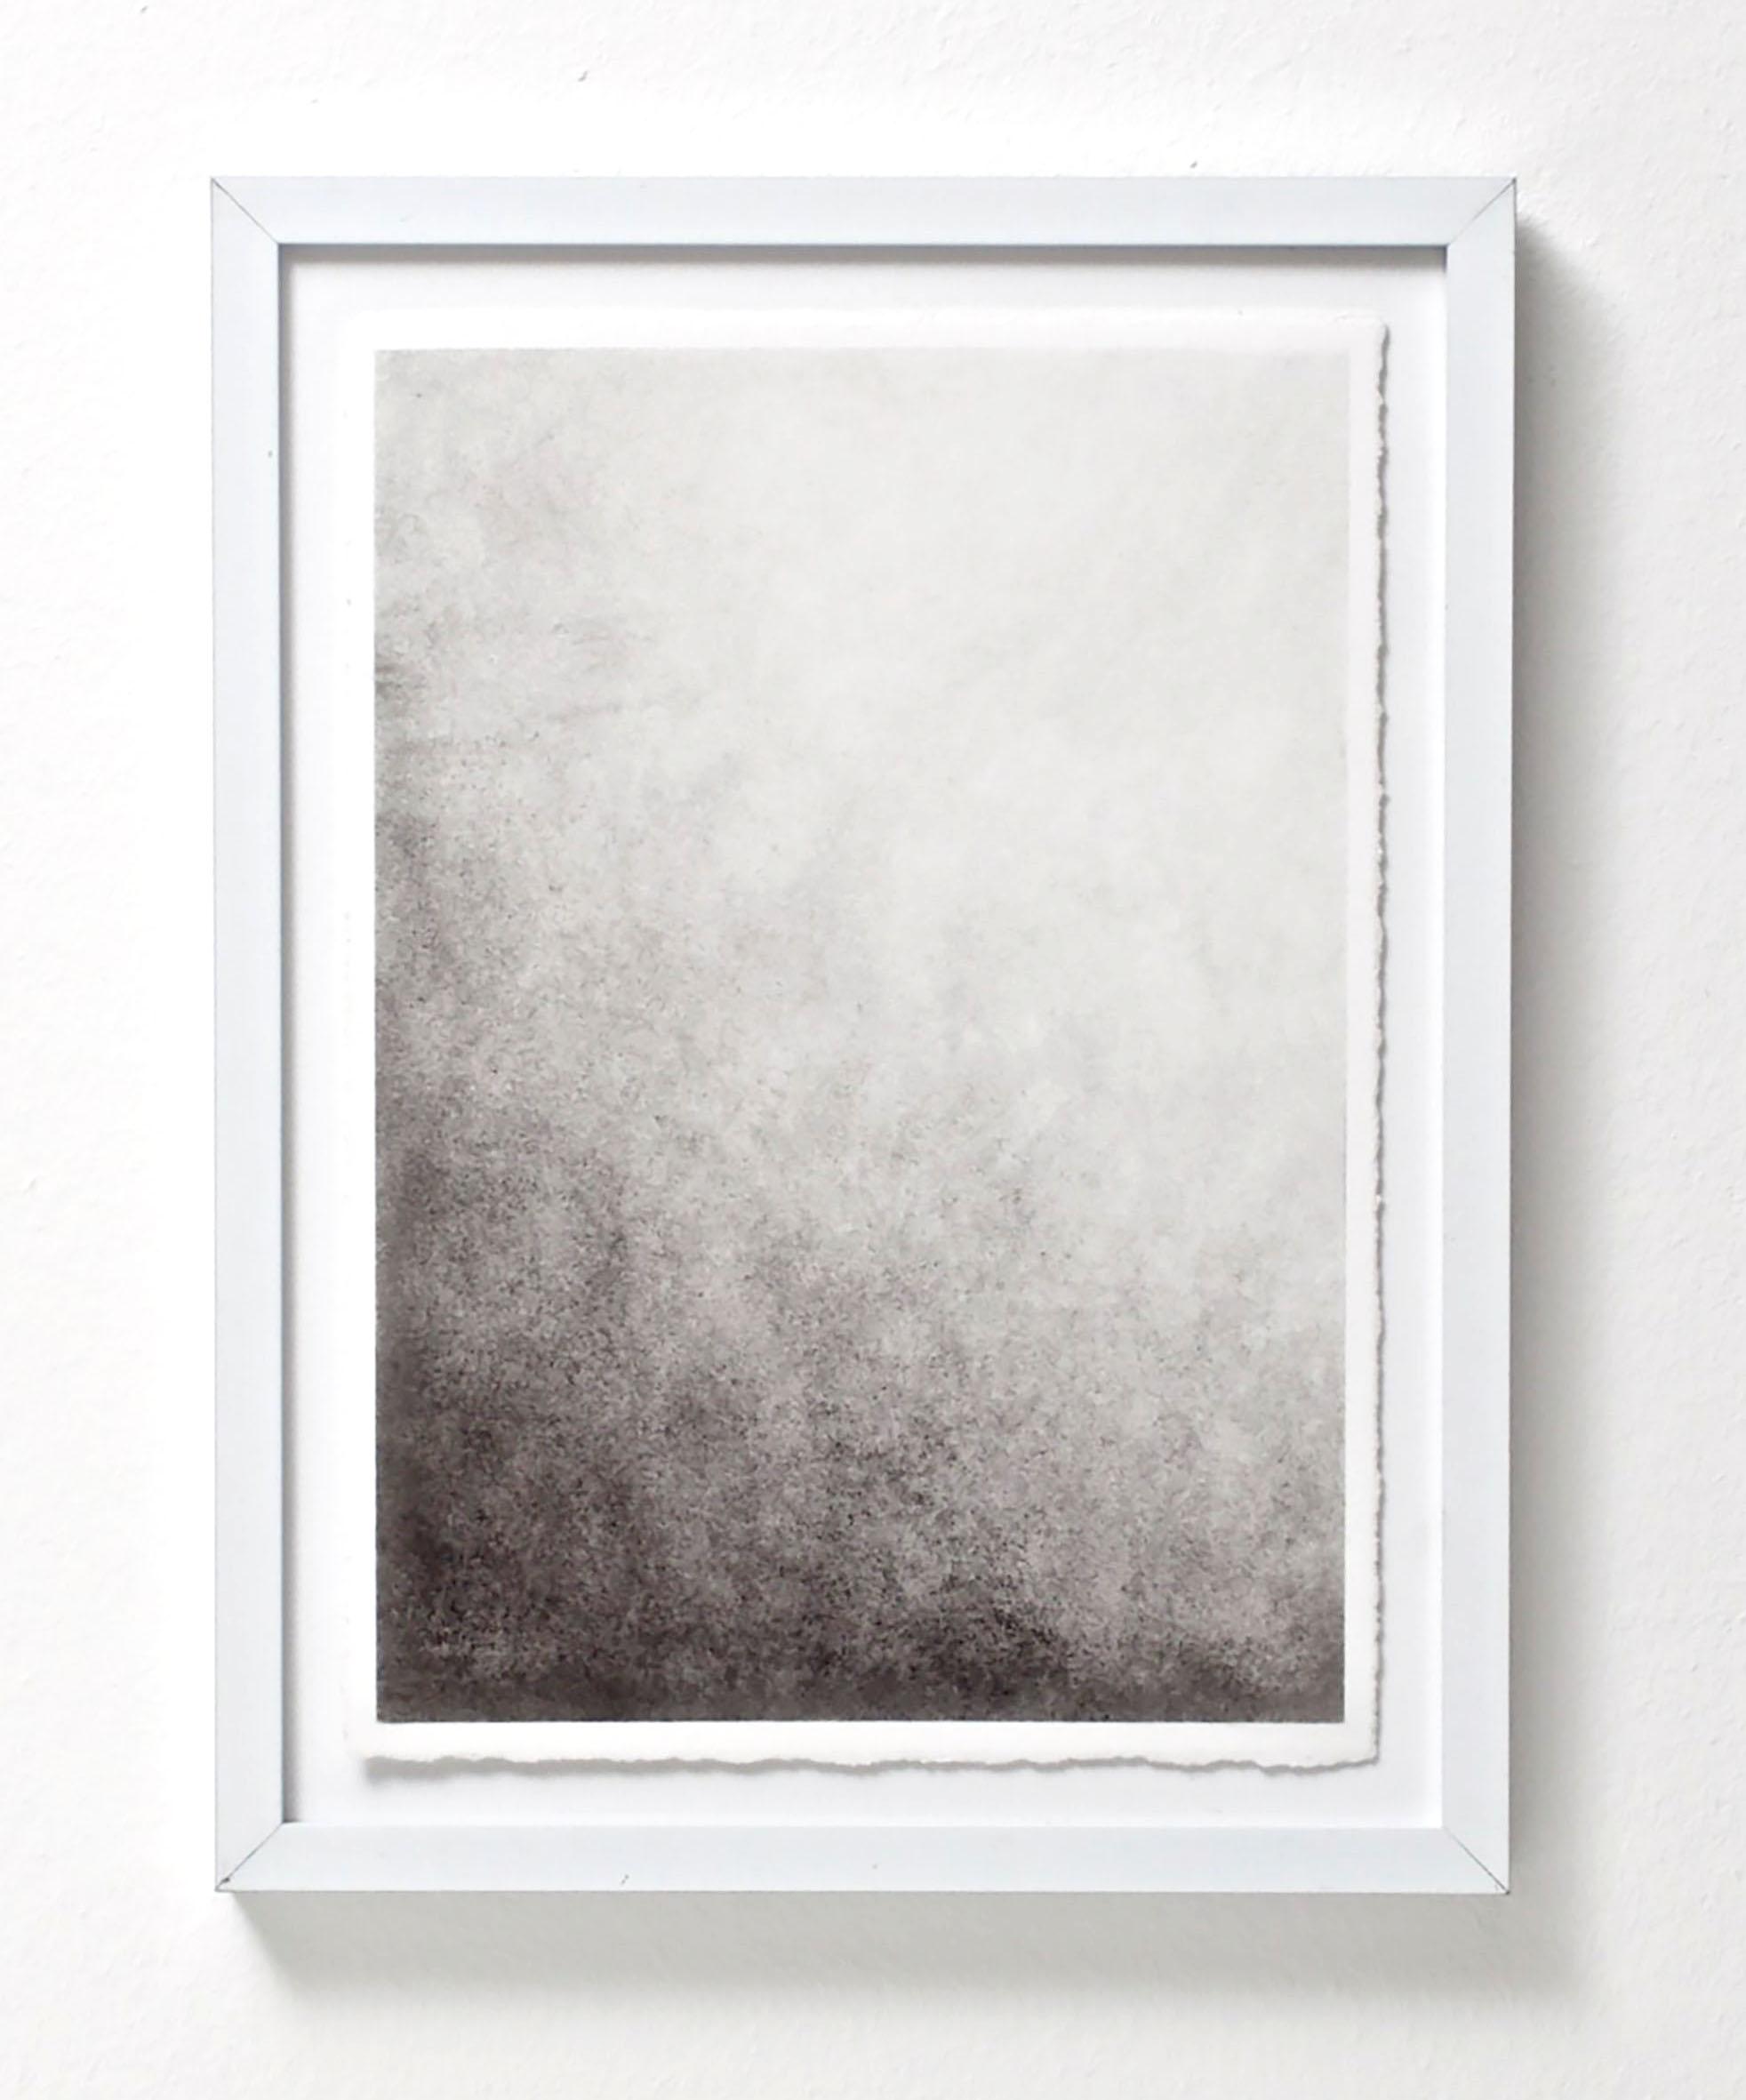 Nordic Light 3 by Beatrice Felicki